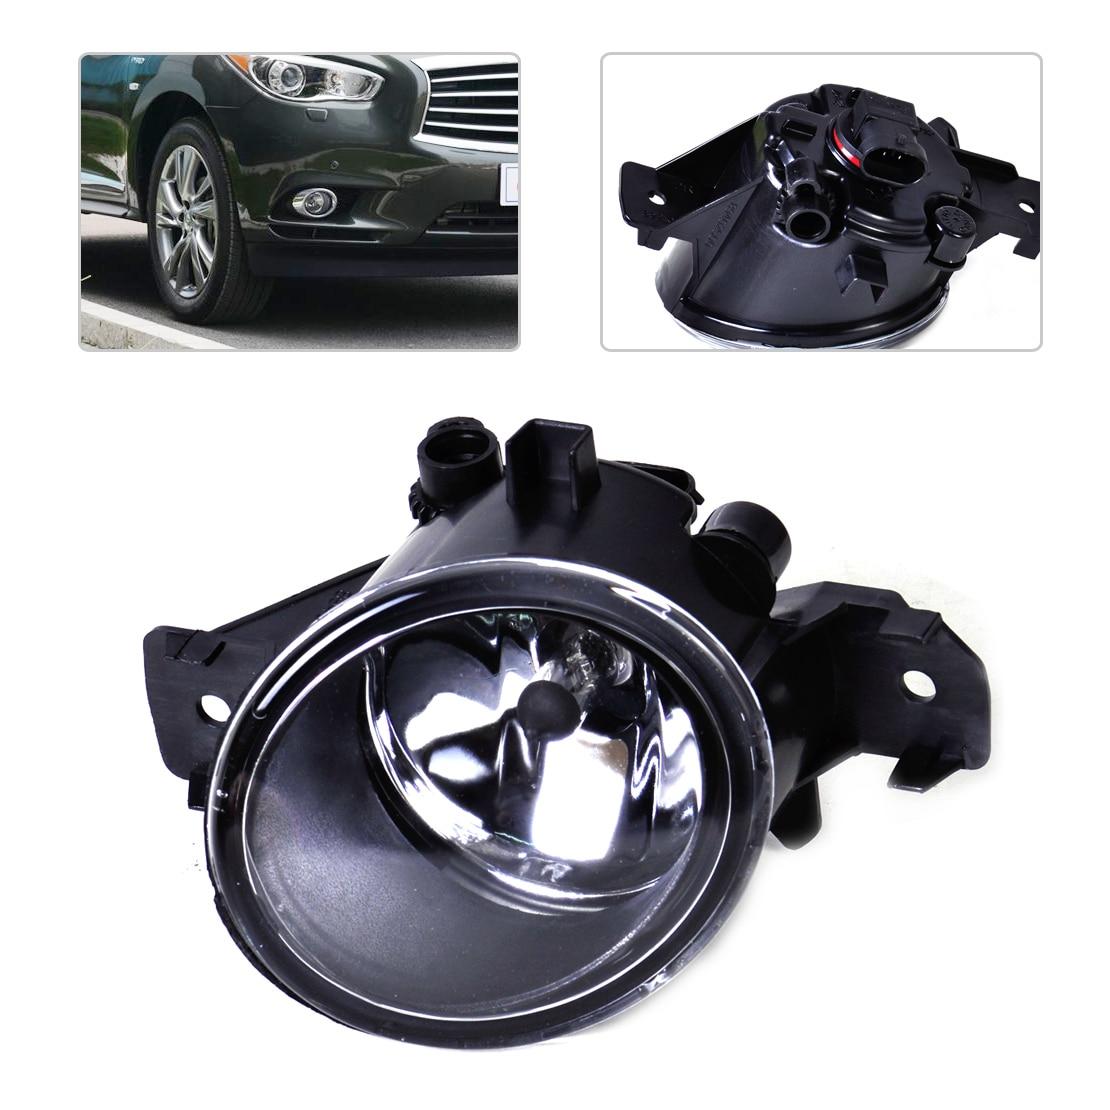 DWCX 26150-89927 Right Fog Light Lamp + Halogen Bulb for Nissan Altima Sentra Murano Versa Infiniti G37 M35 M45 QX60 JX35 цена 2017